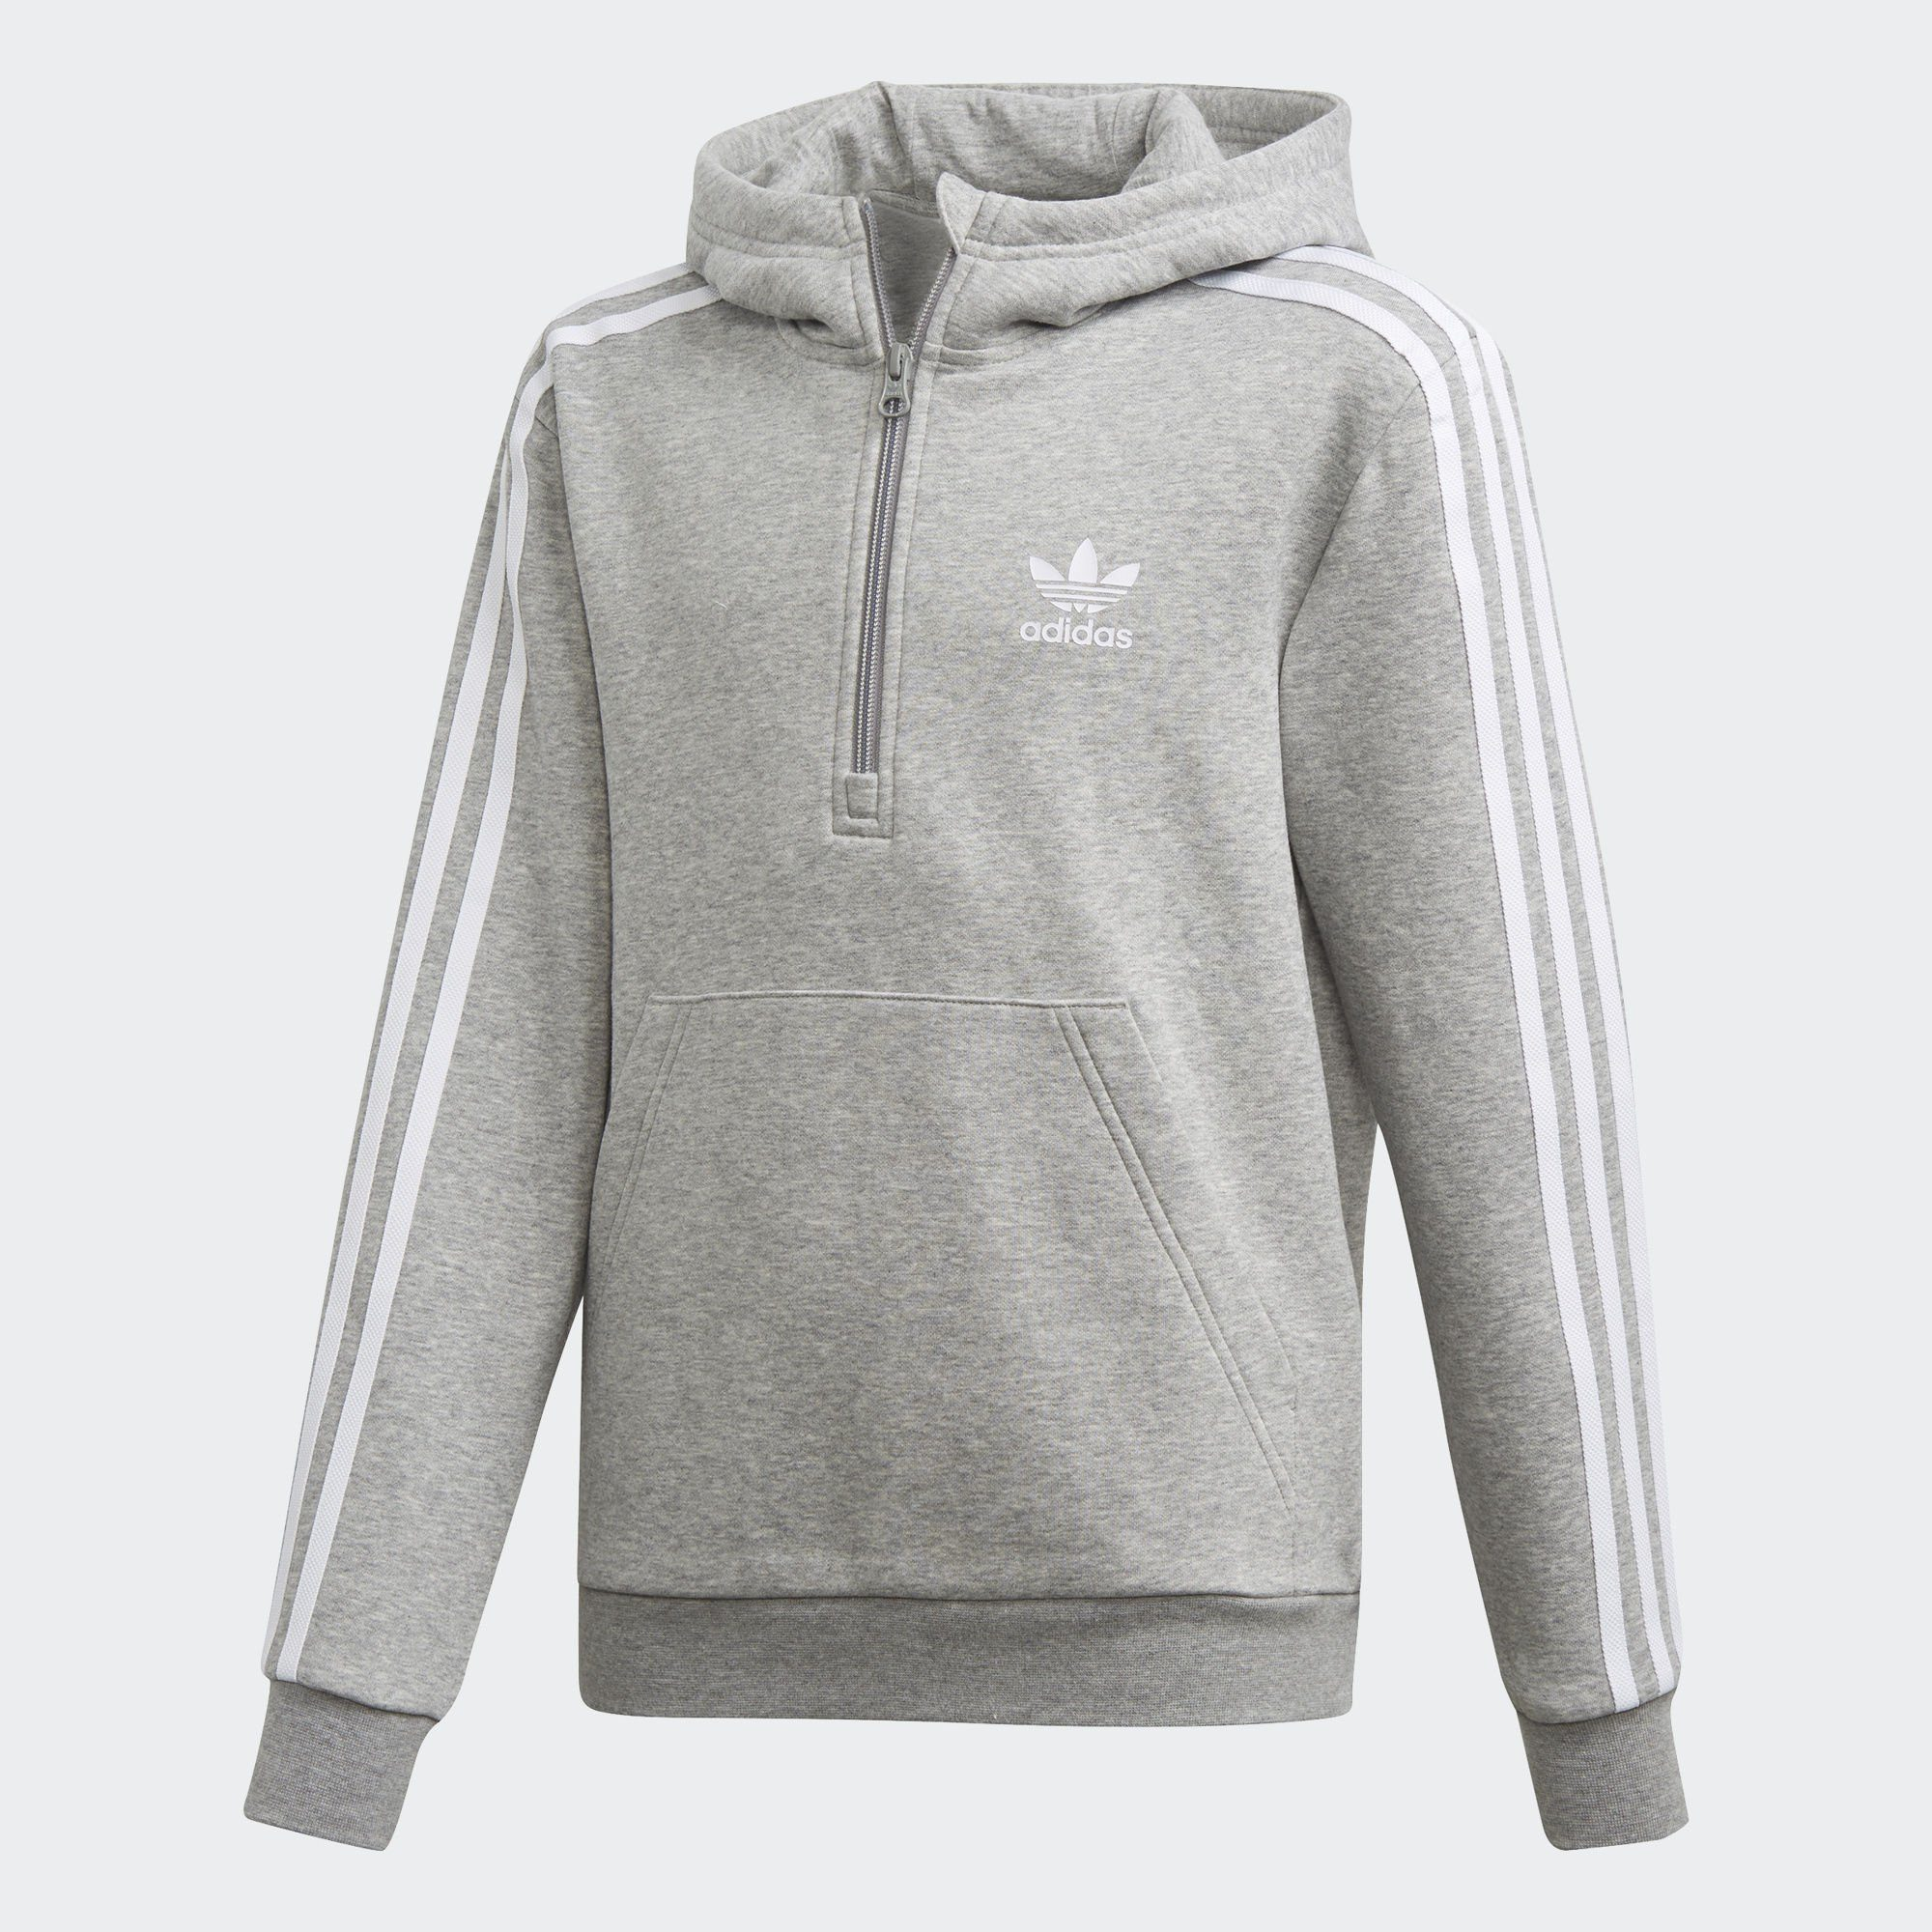 adidas Performance Sweatjacke »Sport ID Branded Kapuzenjacke« Sport ID online kaufen | OTTO